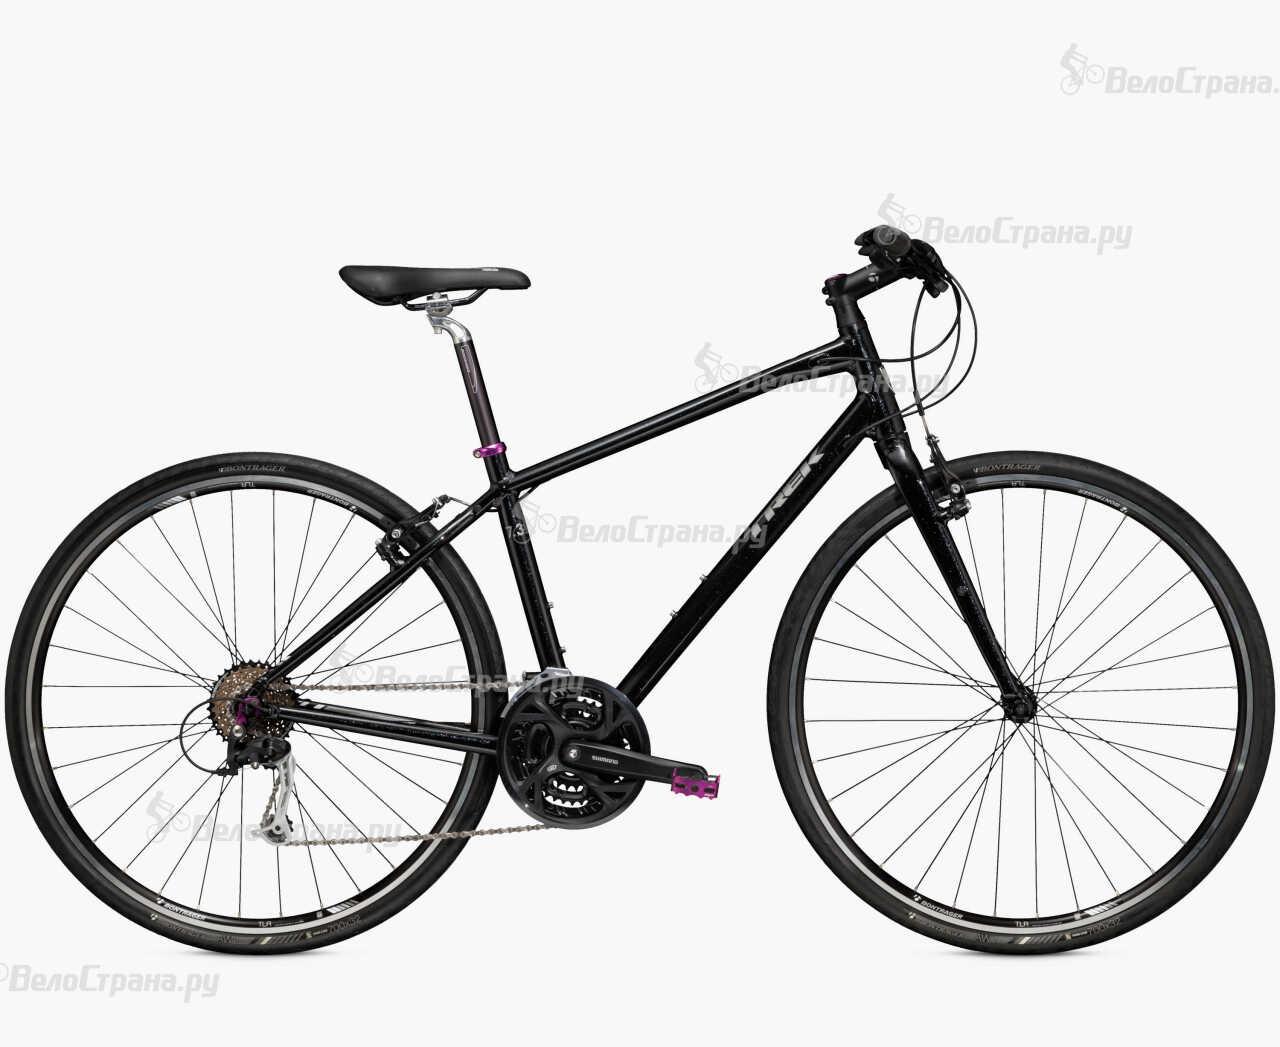 Велосипед Trek 7.3 FX WSD (2016) trek 7 2 fx wsd 2015